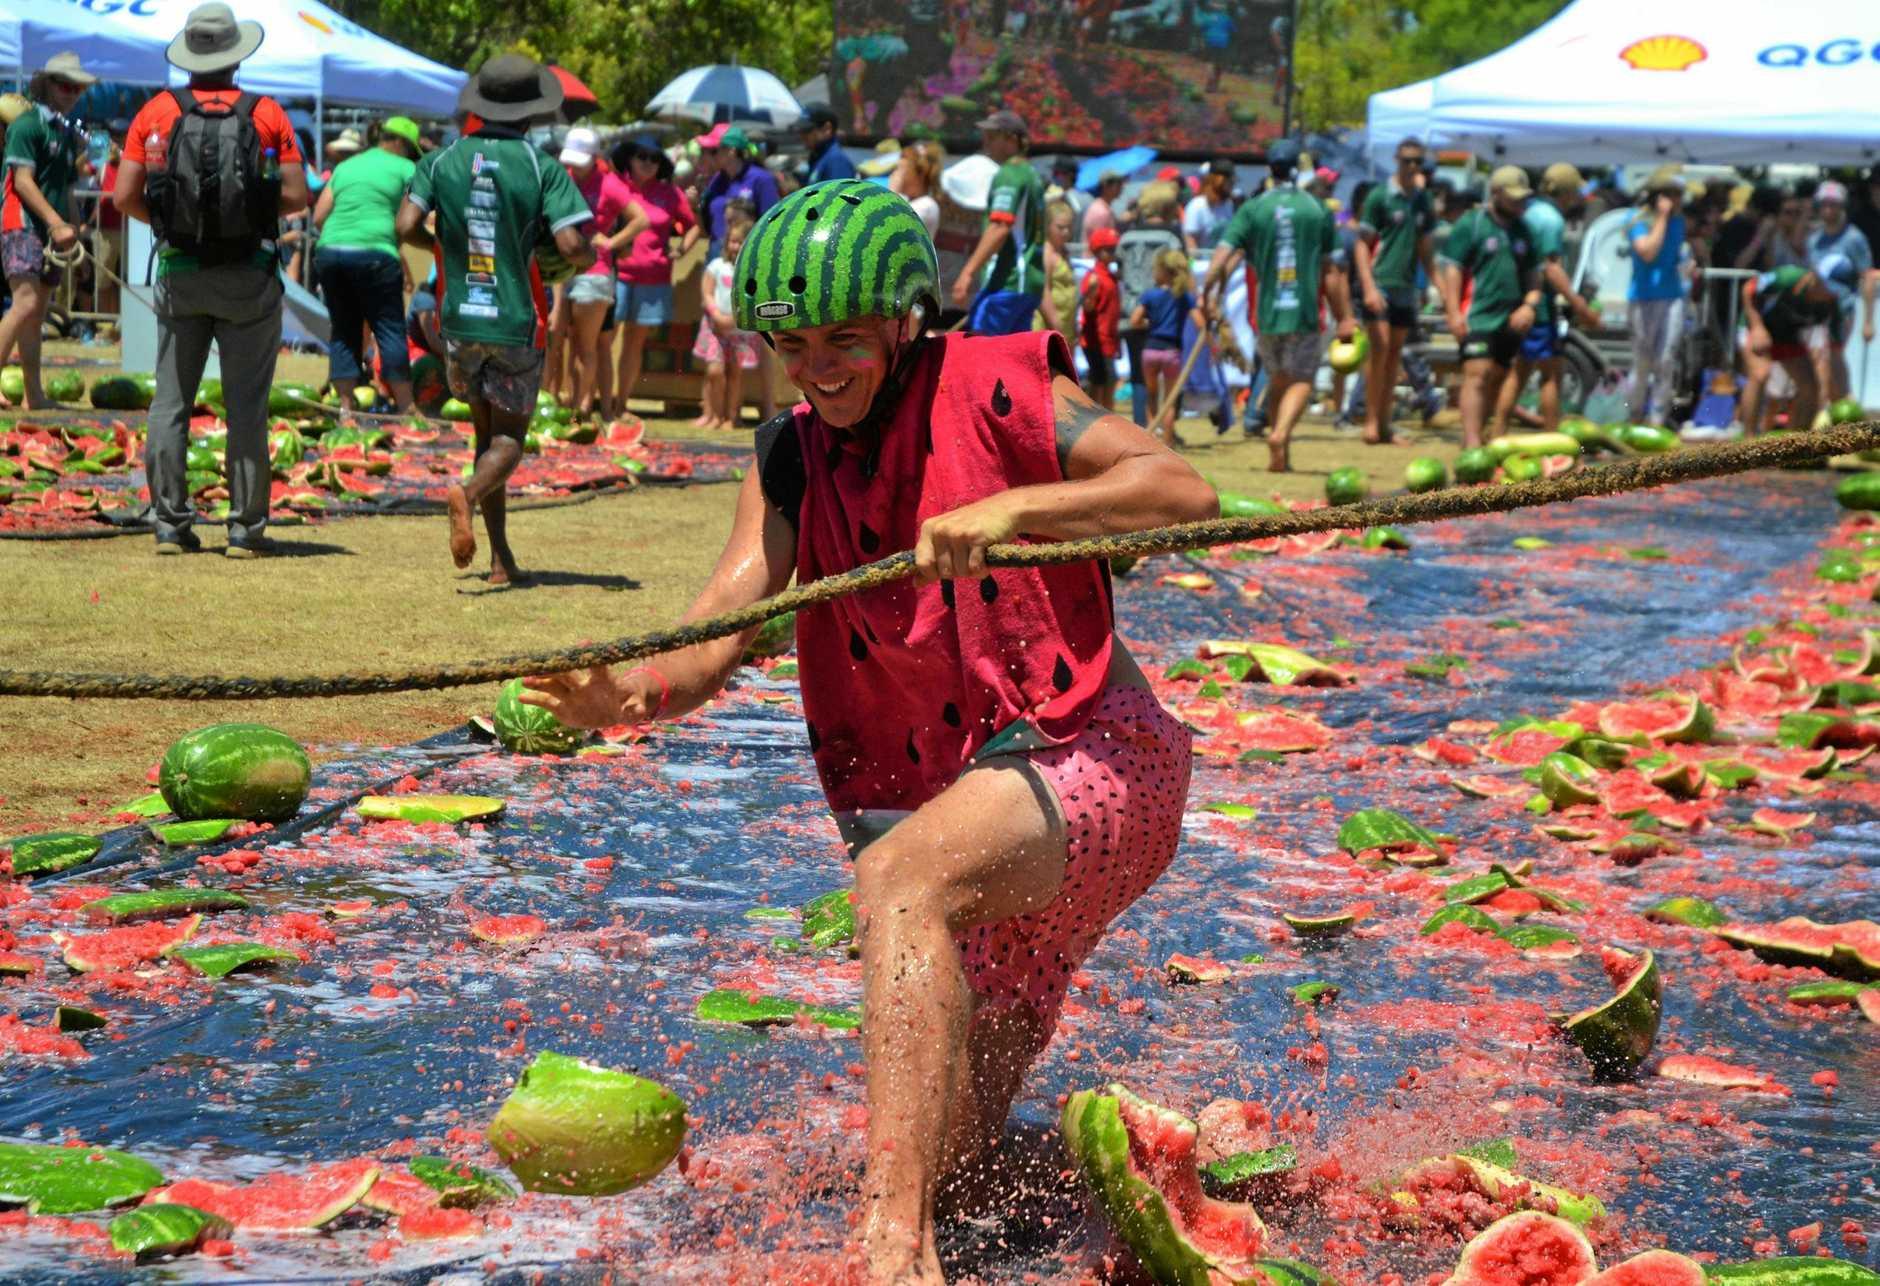 SLIPPING GOOD FUN: Kris Crews at the melon skiing event at the 2019 Chinchilla Melon Festival.